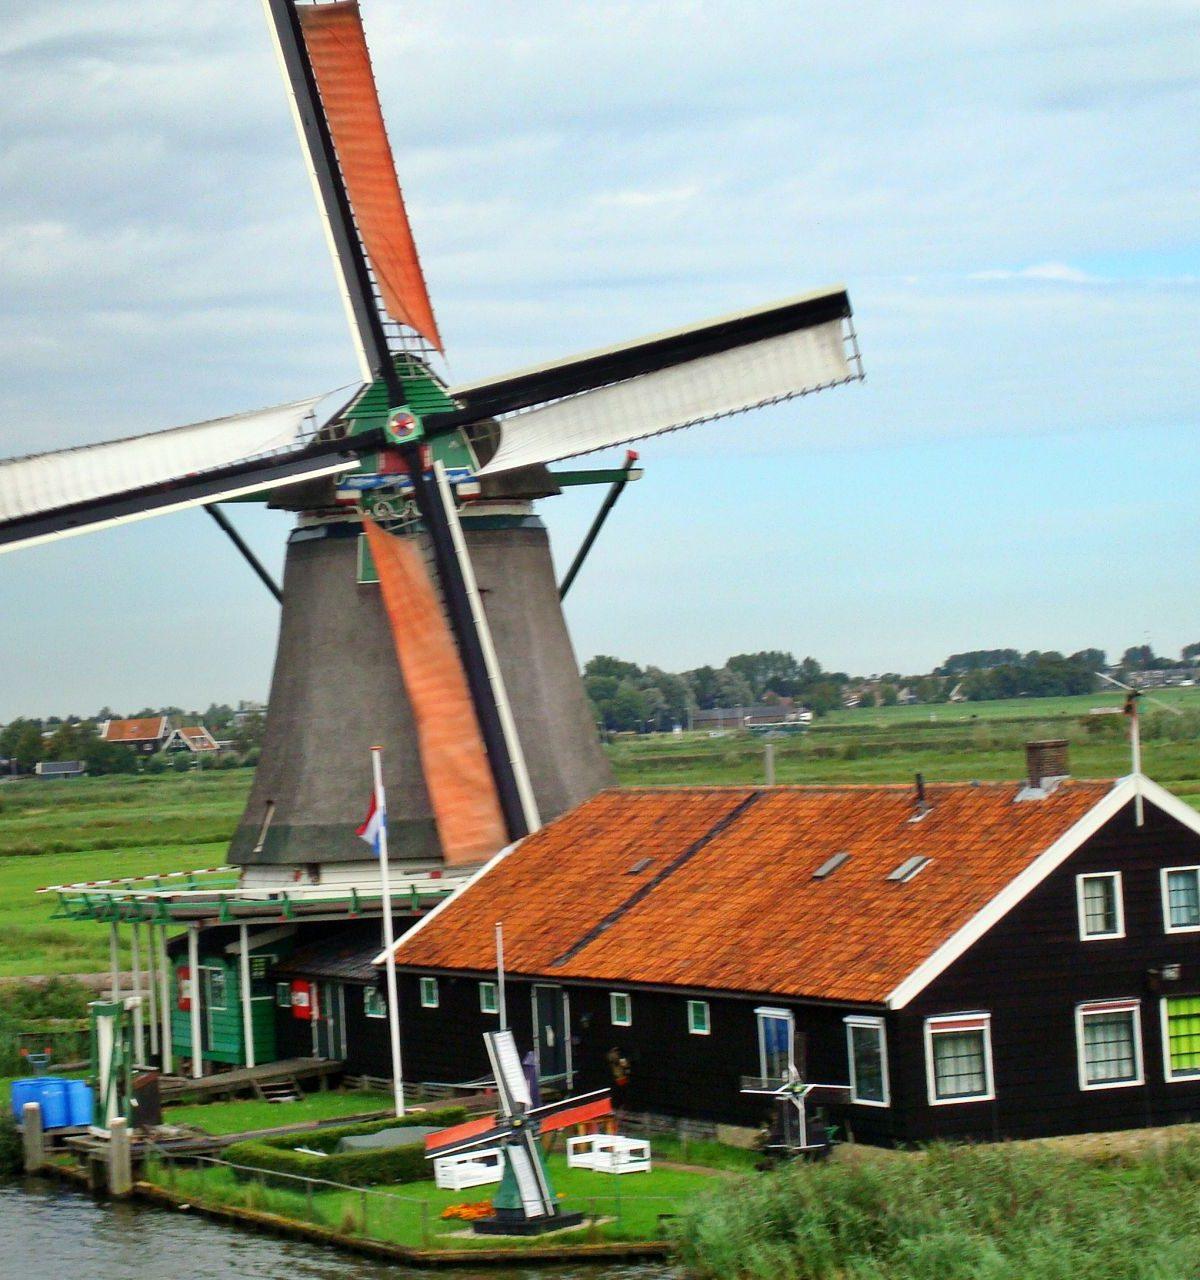 windmolen zaanse schans noord holland hotelb&b lanormande-25